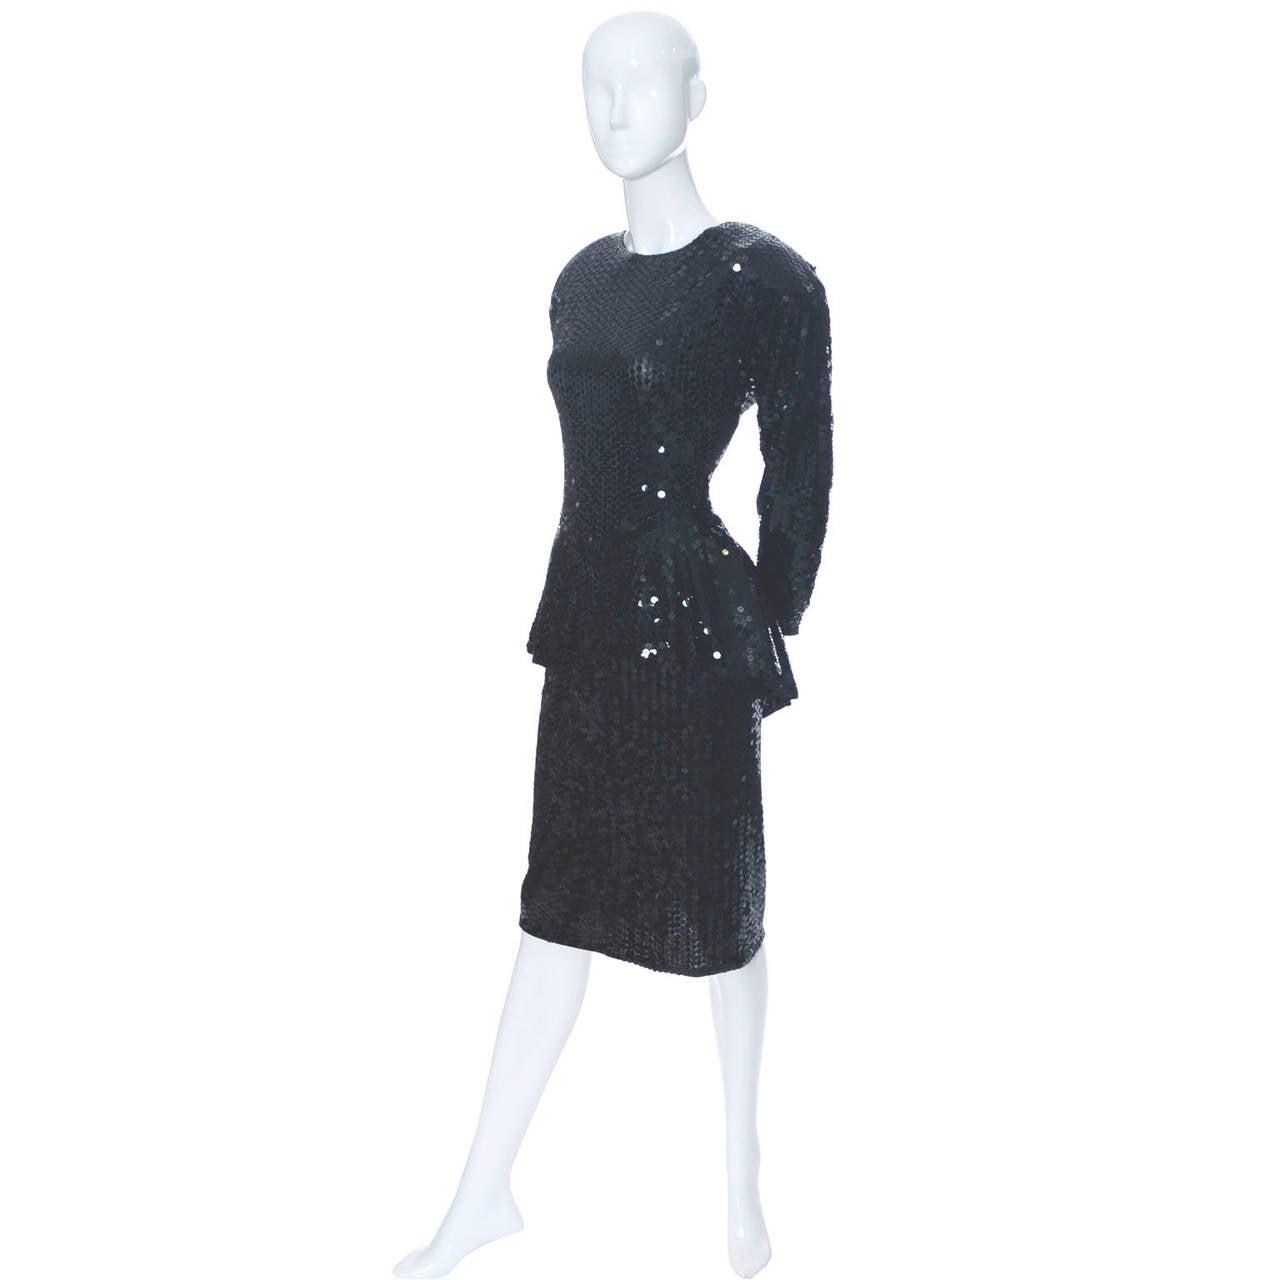 Women's Oleg Cassini Vintage Dress Black Sequins Peplum 1980s Evening For Sale